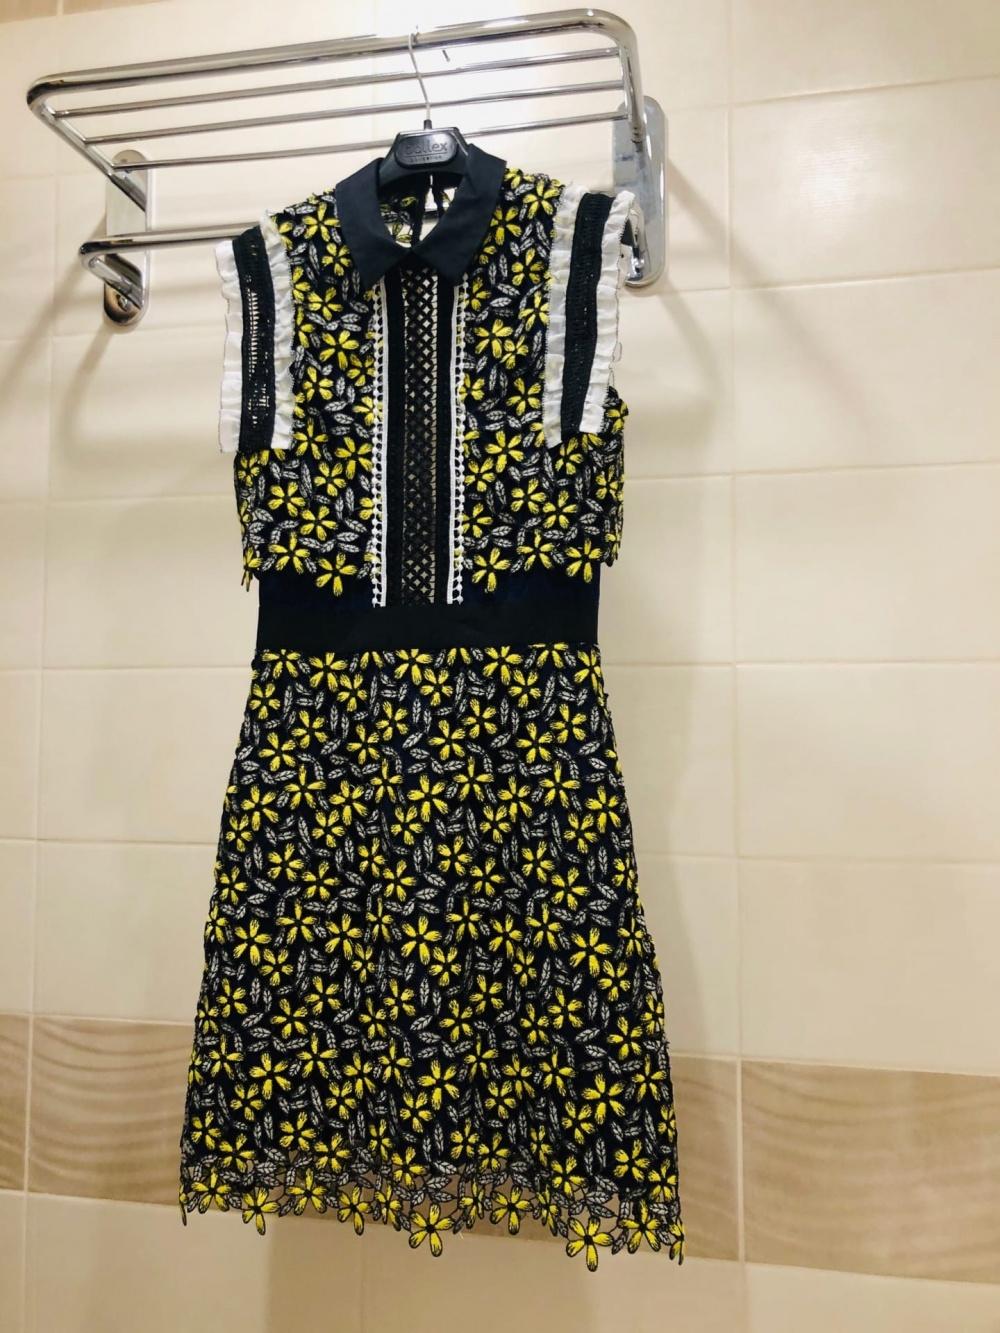 Платье Self-Portrait Eleina Sculpted Daisy Guipure Dress.Размер  US 4/UK 8.